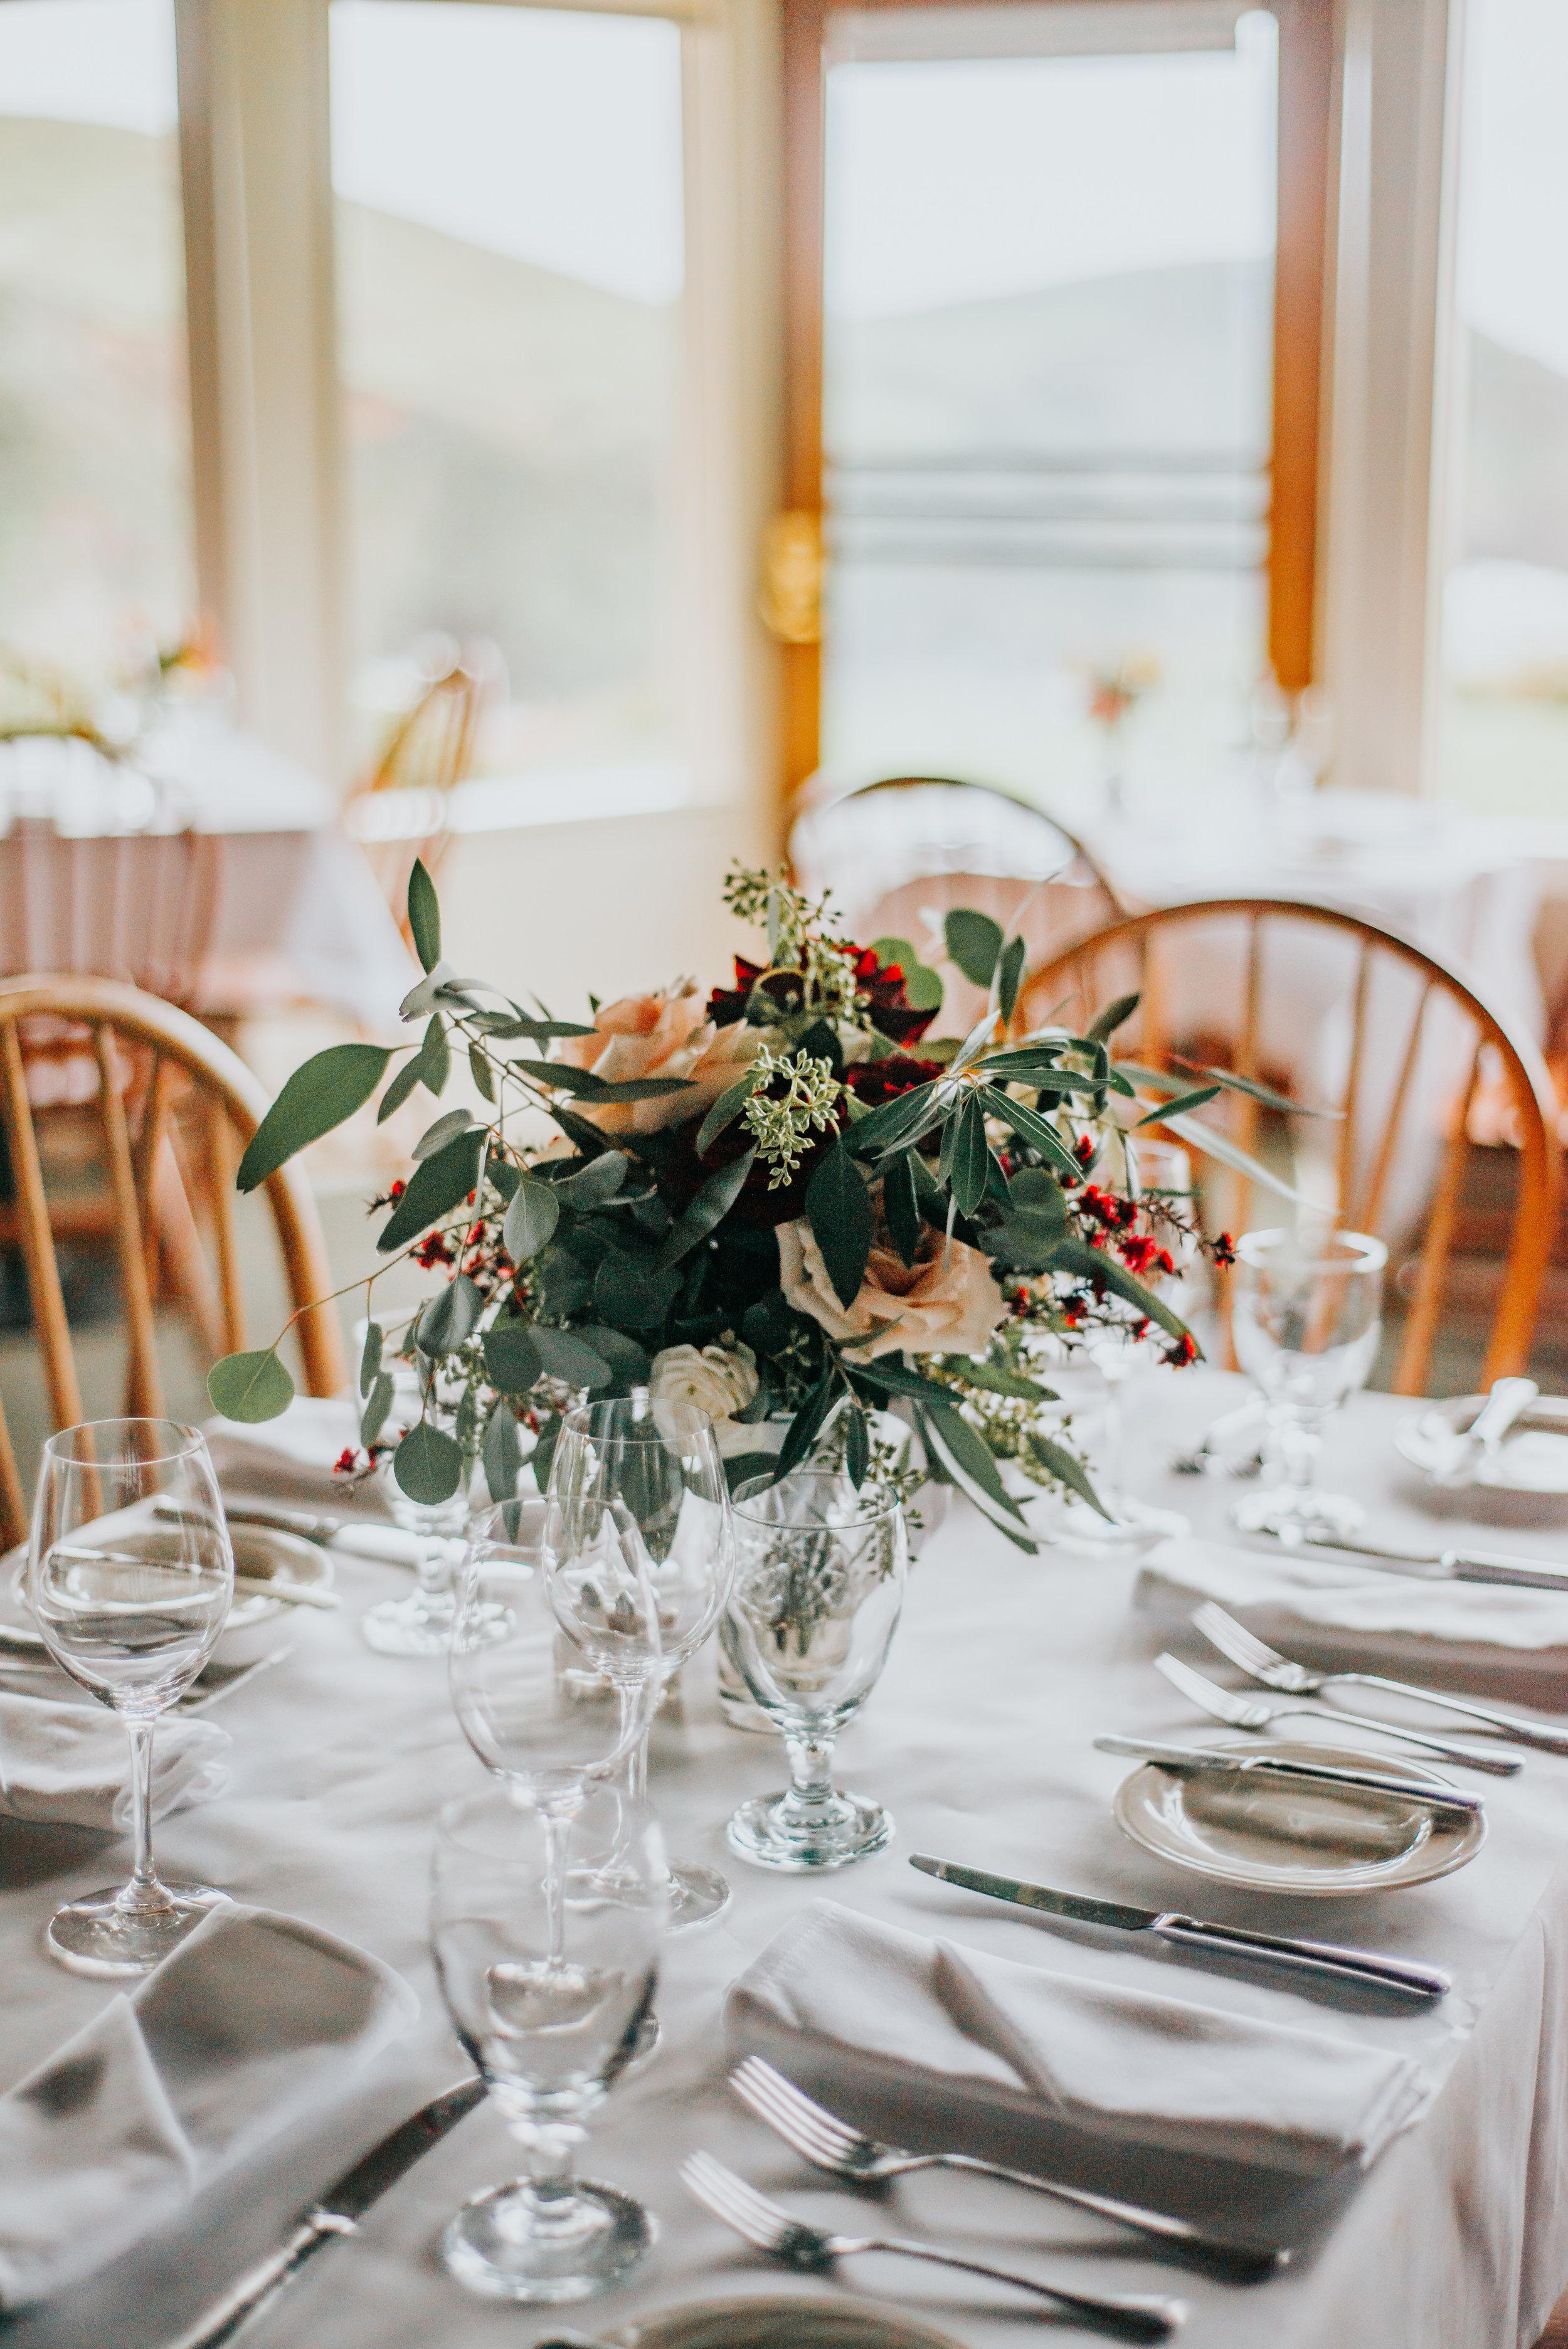 Albion River Inn Wedding in Albion Caliornia-96.jpg